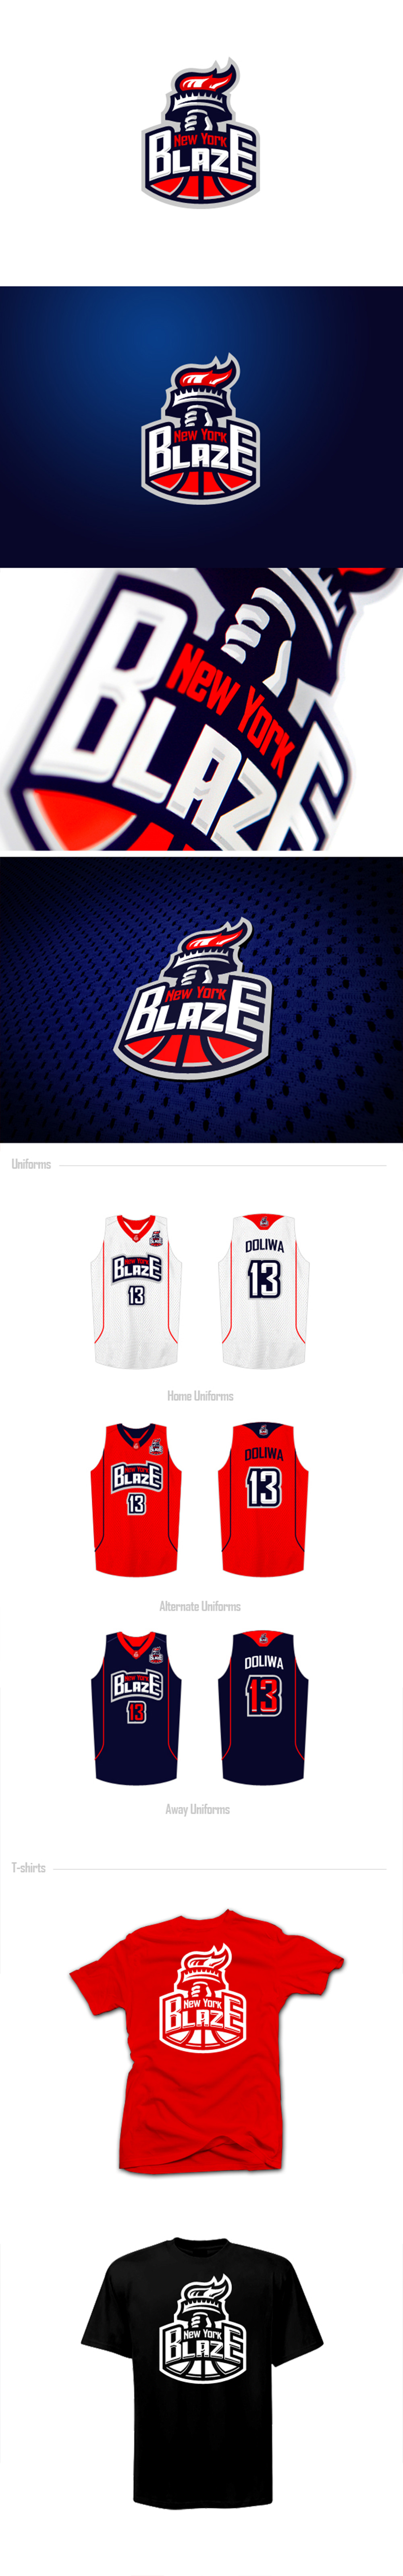 Basketball Team Logo: New York Blaze by Lunatic